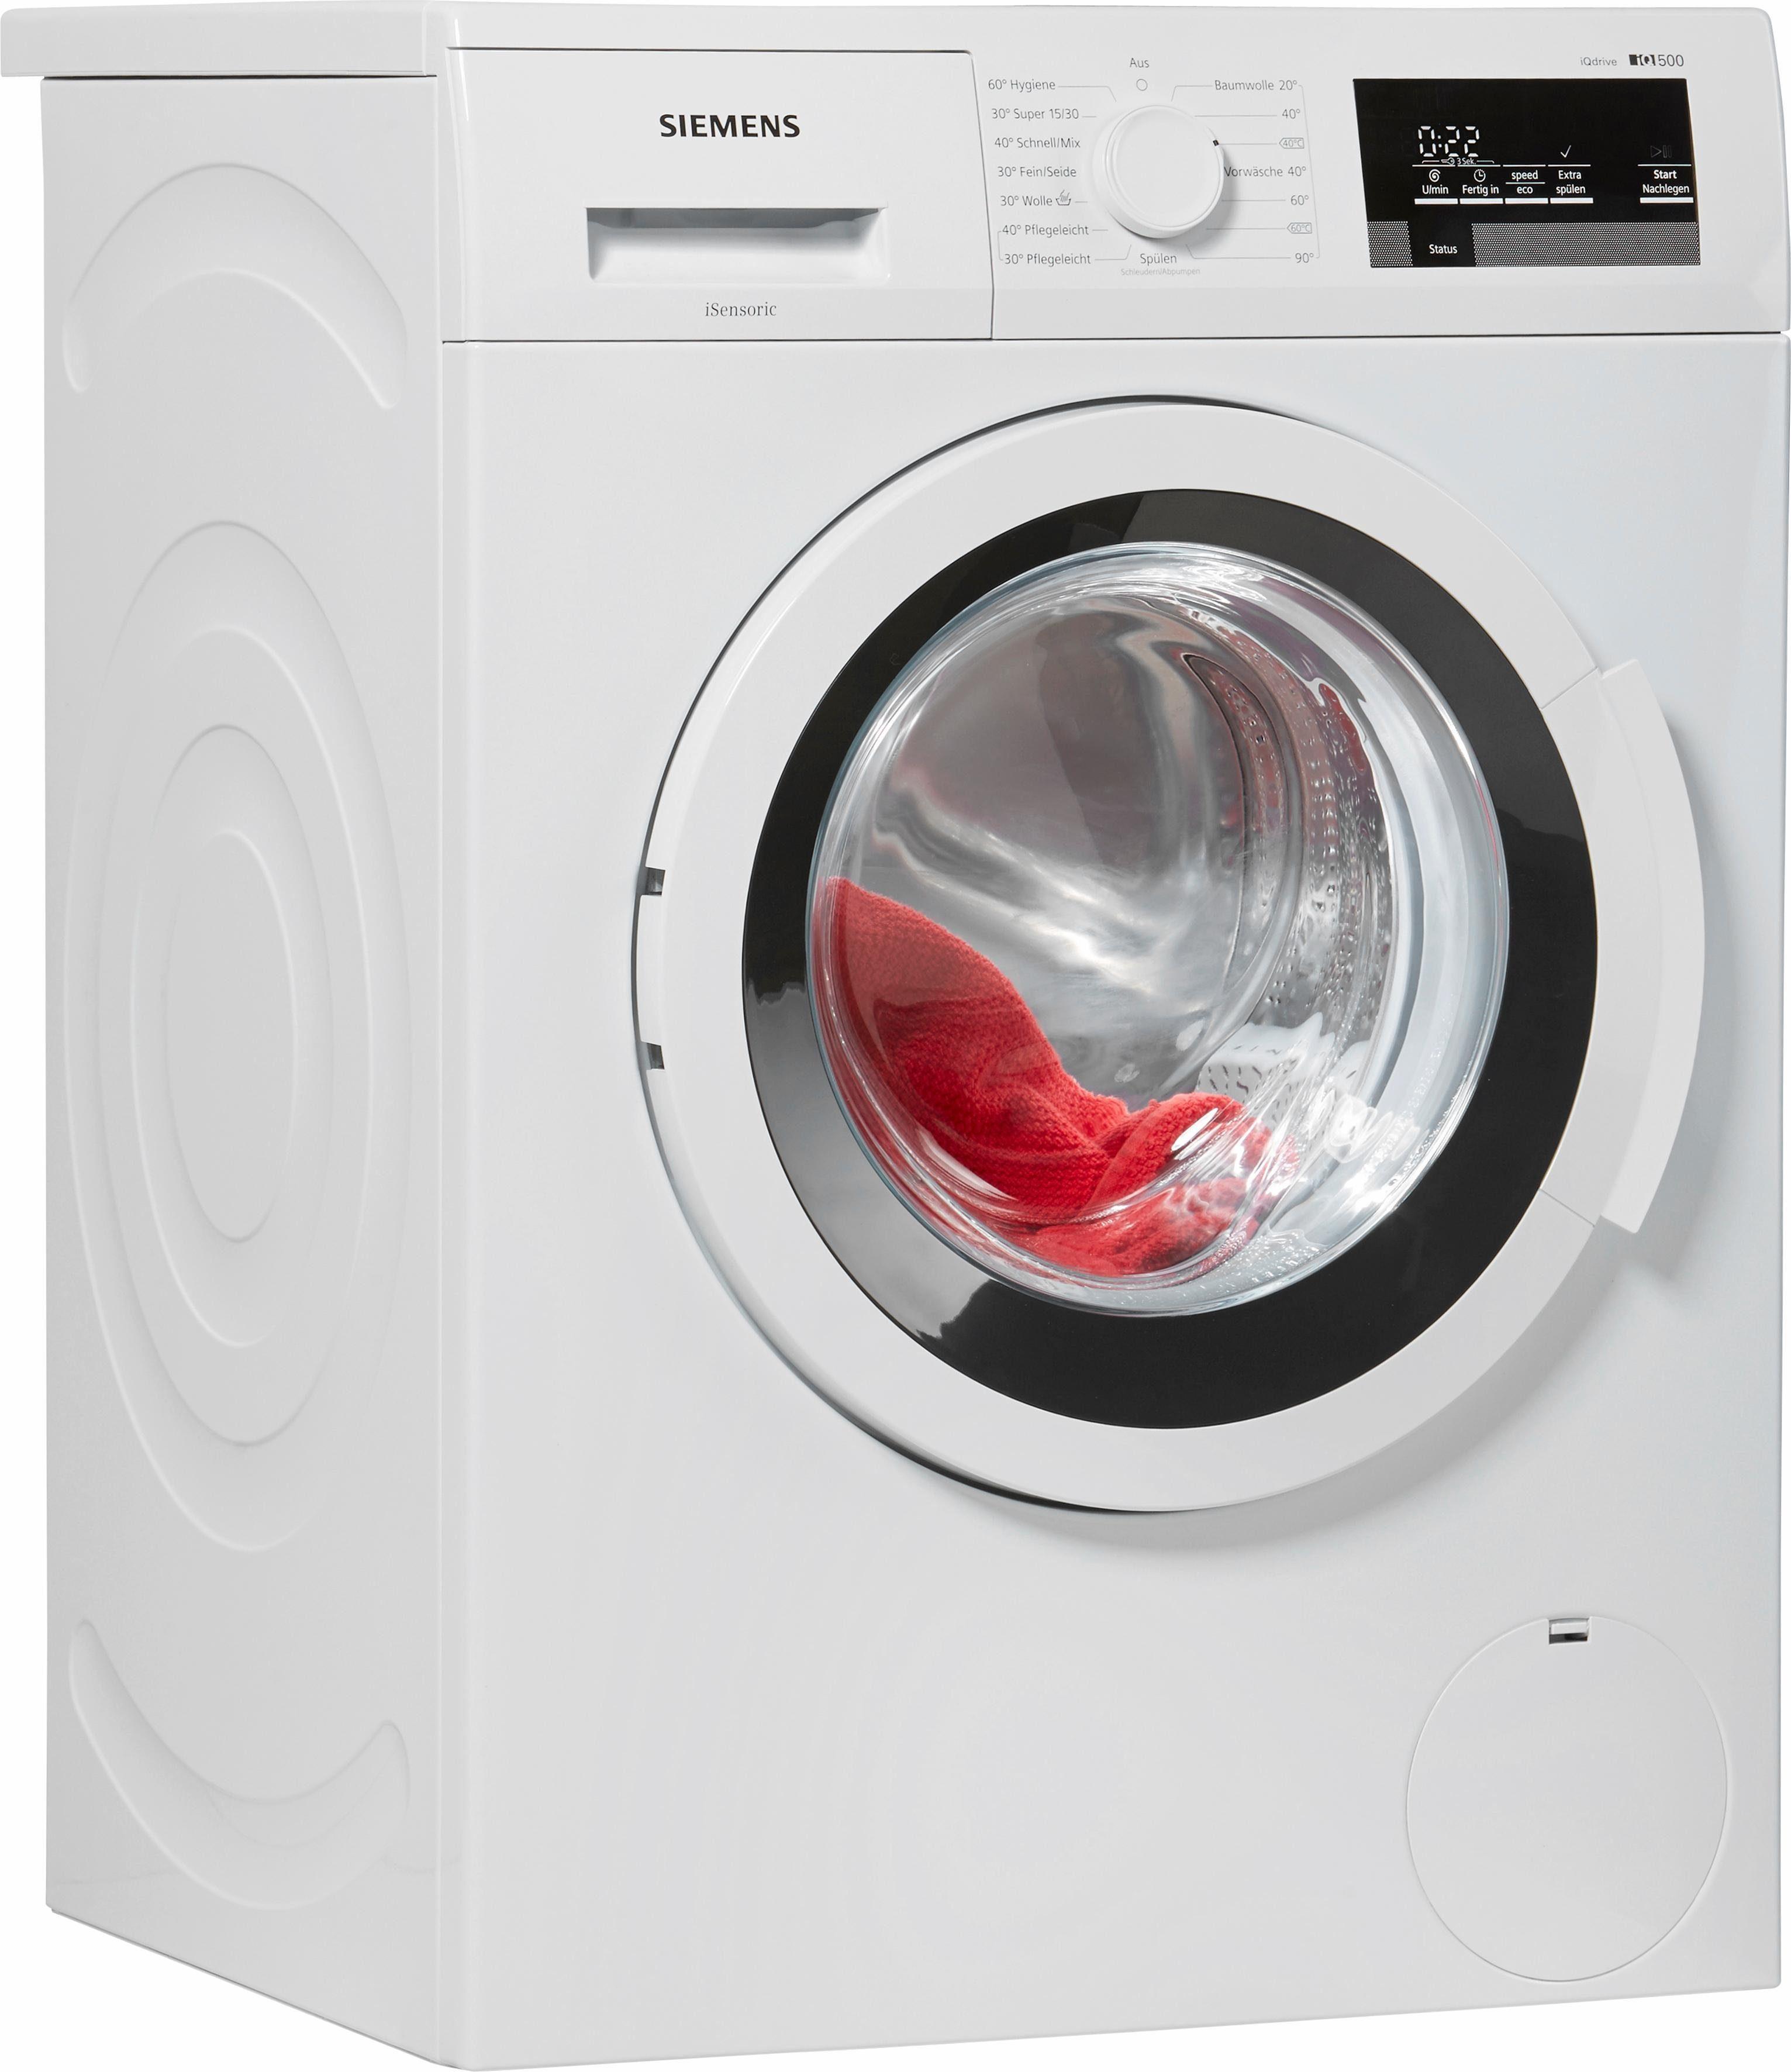 SIEMENS Waschmaschine WM14T3V0, A+++, 8 kg, 1400 U/Min